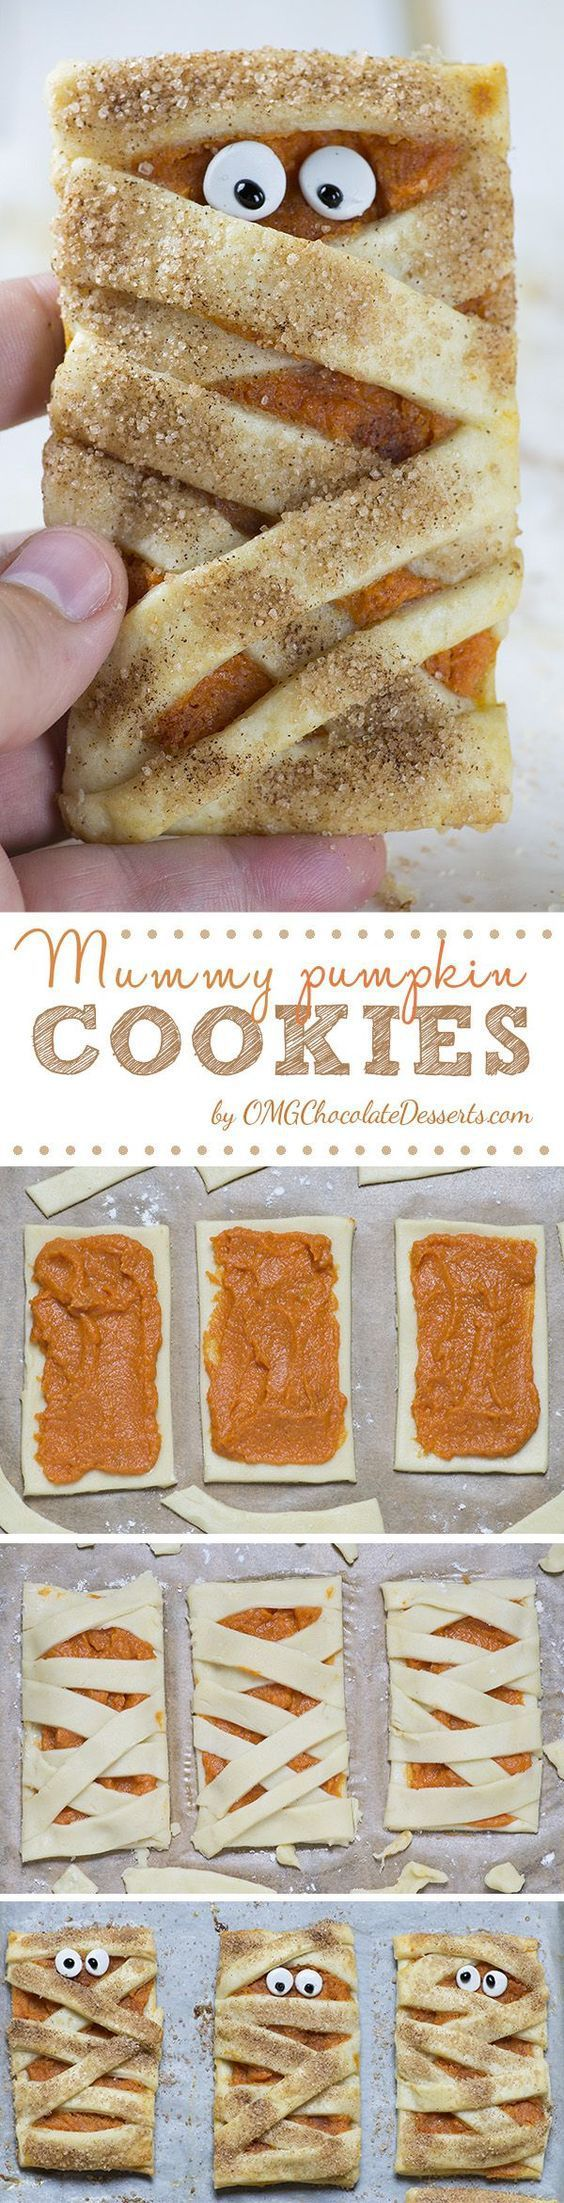 Halloween Party Treats Appetizers and Desserts Recipes - Mummy Pumpkin Cookies Recipe via OMG Chocolate Desserts